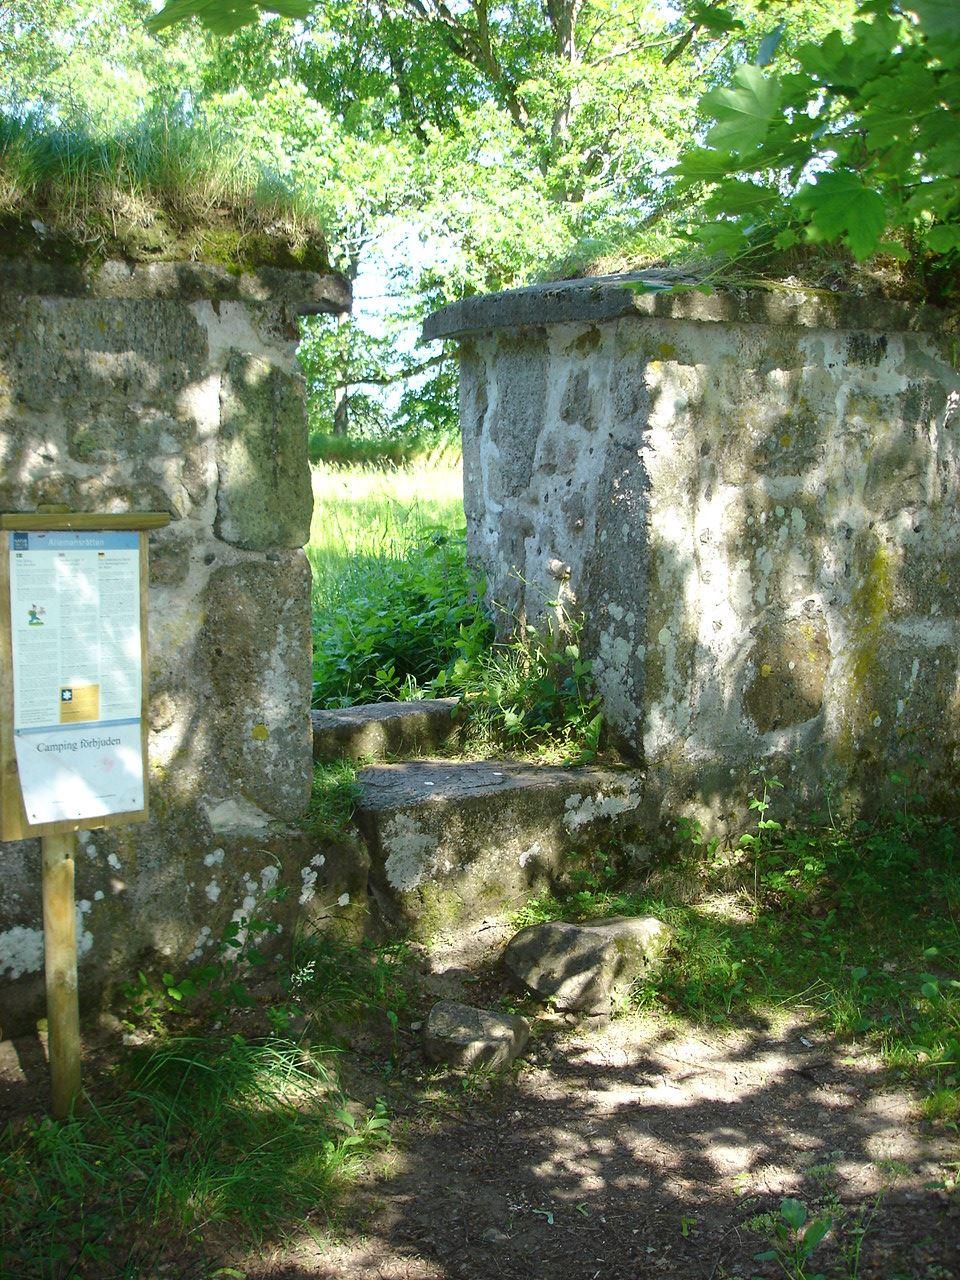 Guided tour at Skeingeborg ruins